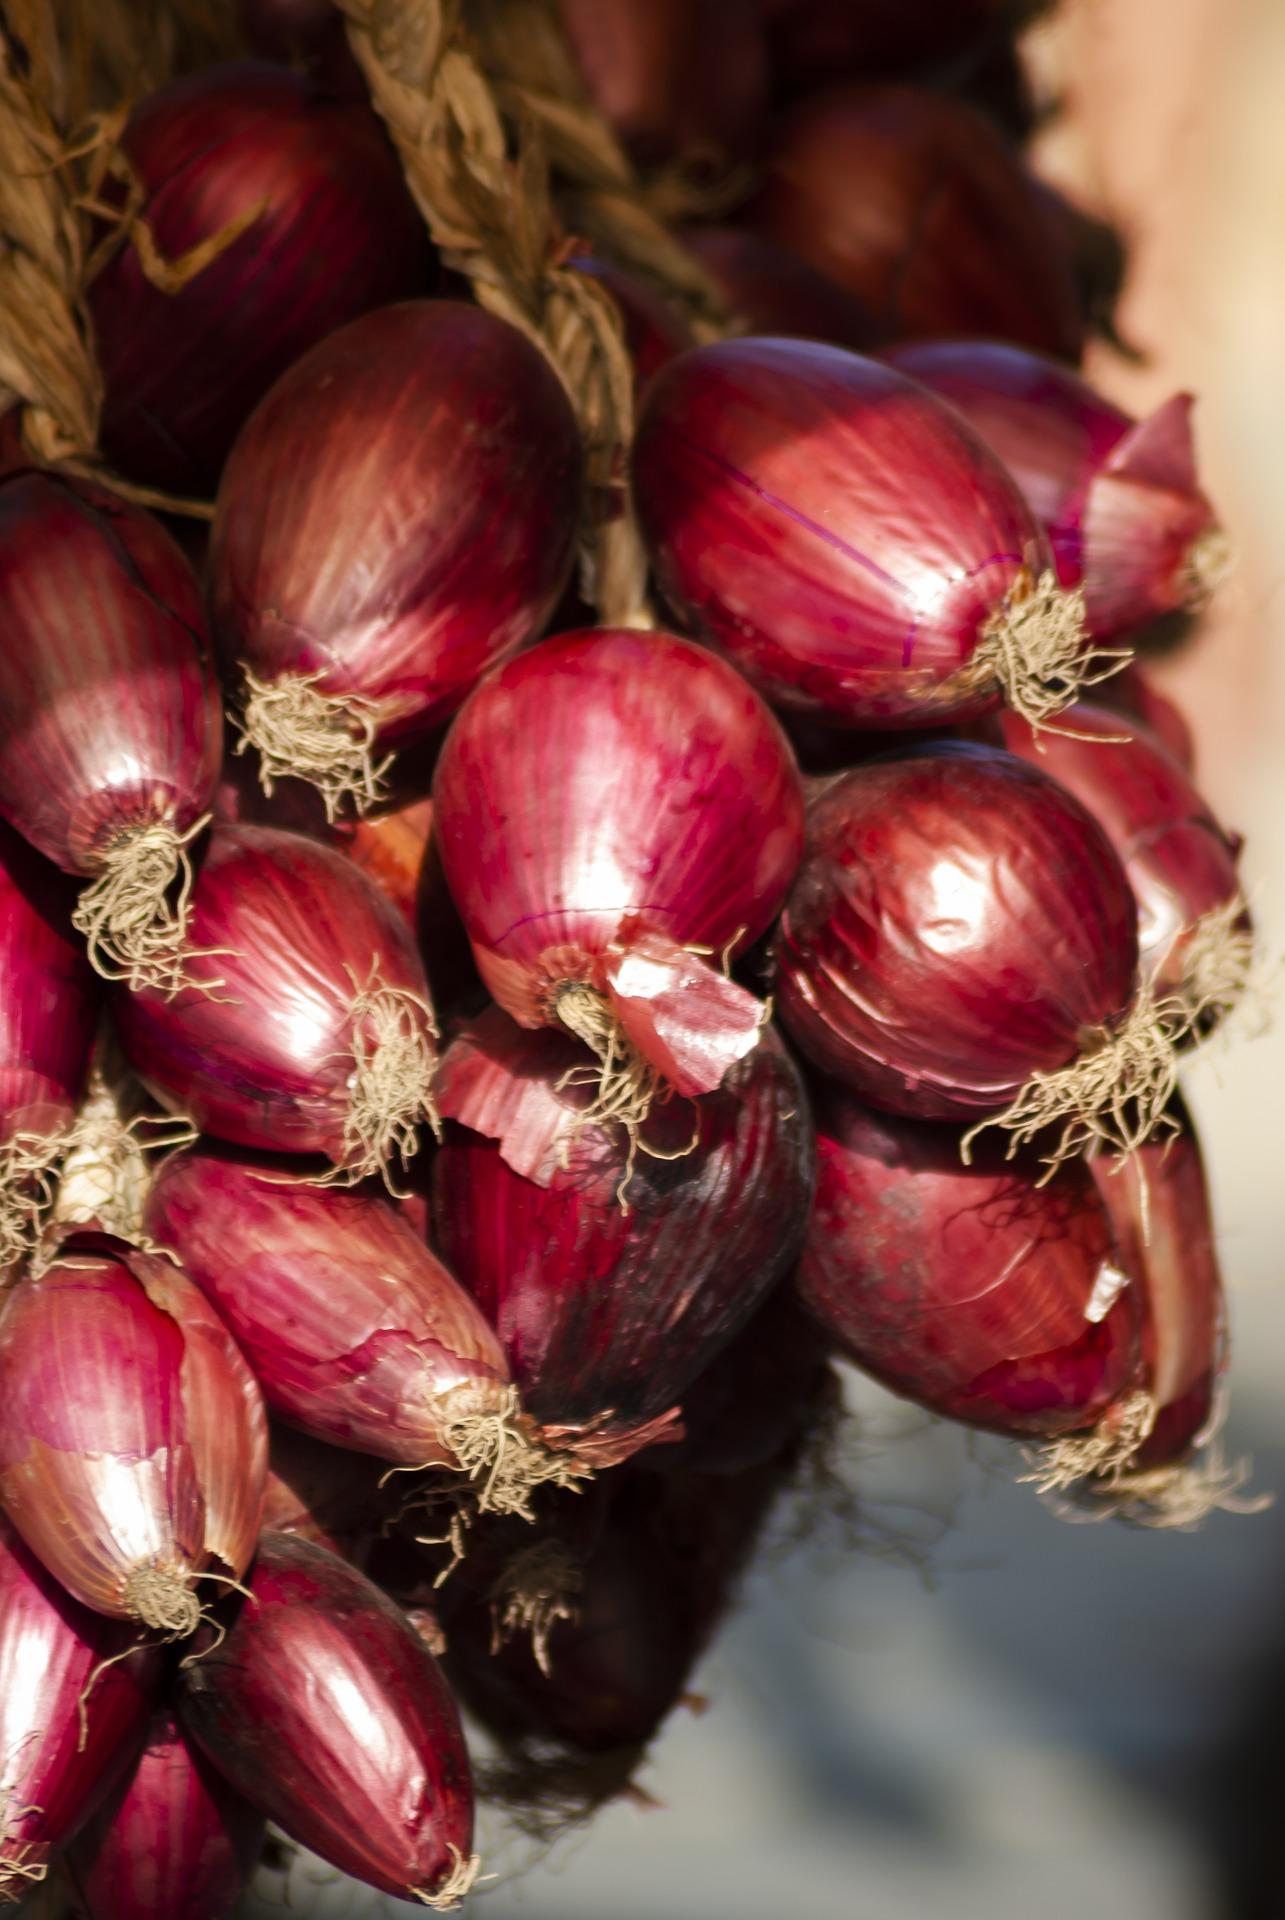 onions-4890846_1920